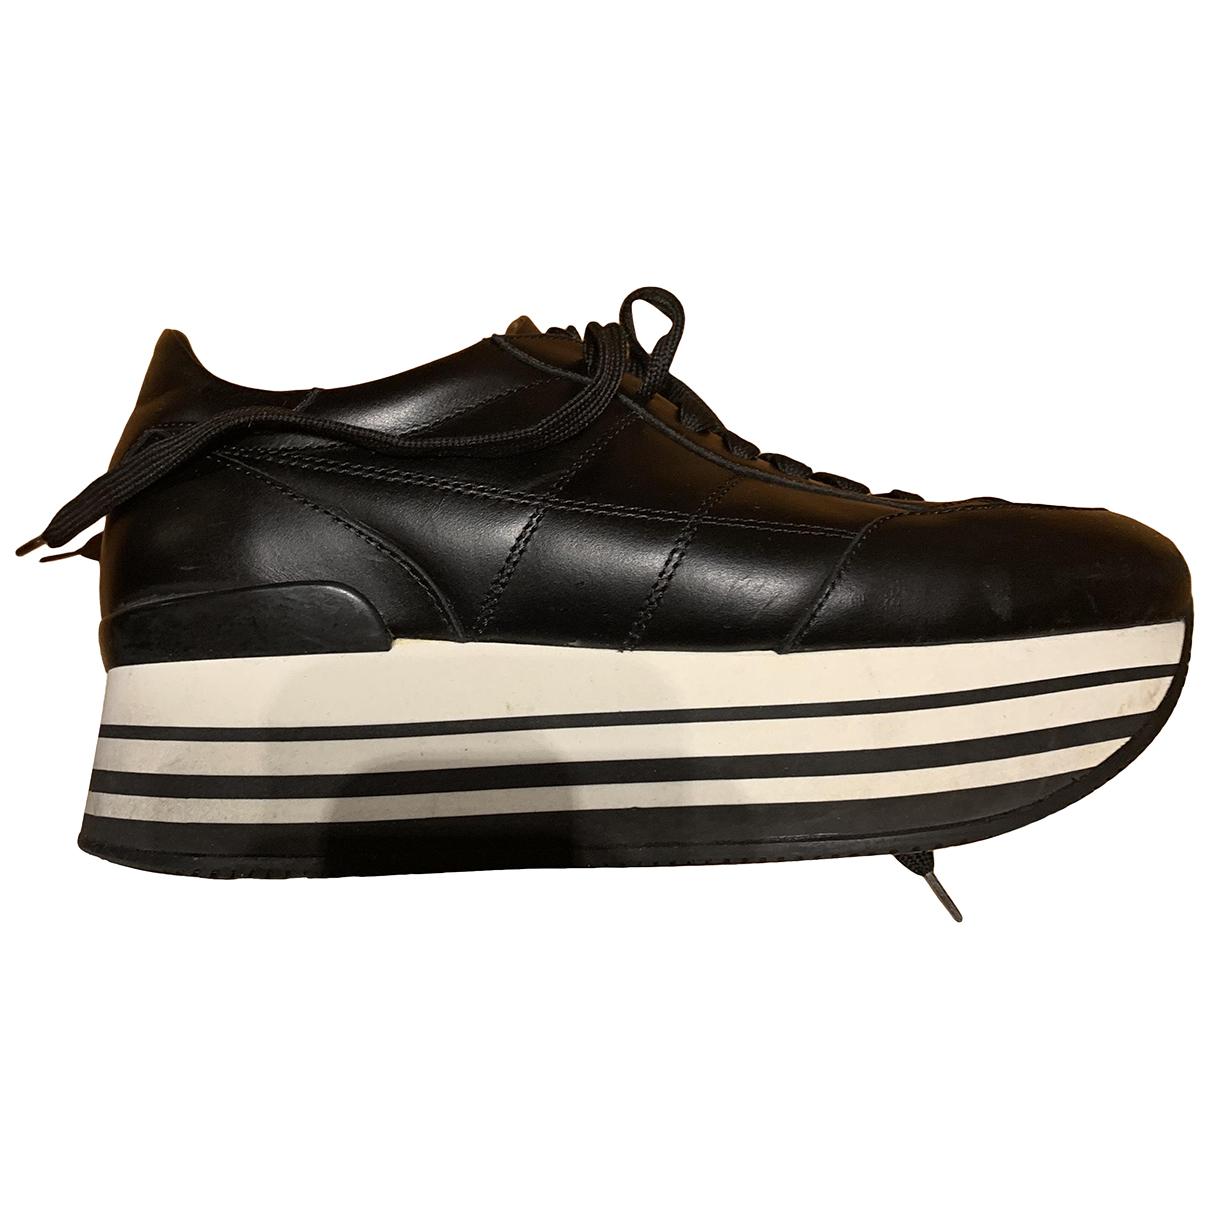 Hogan N Black Leather Trainers for Women 38.5 EU